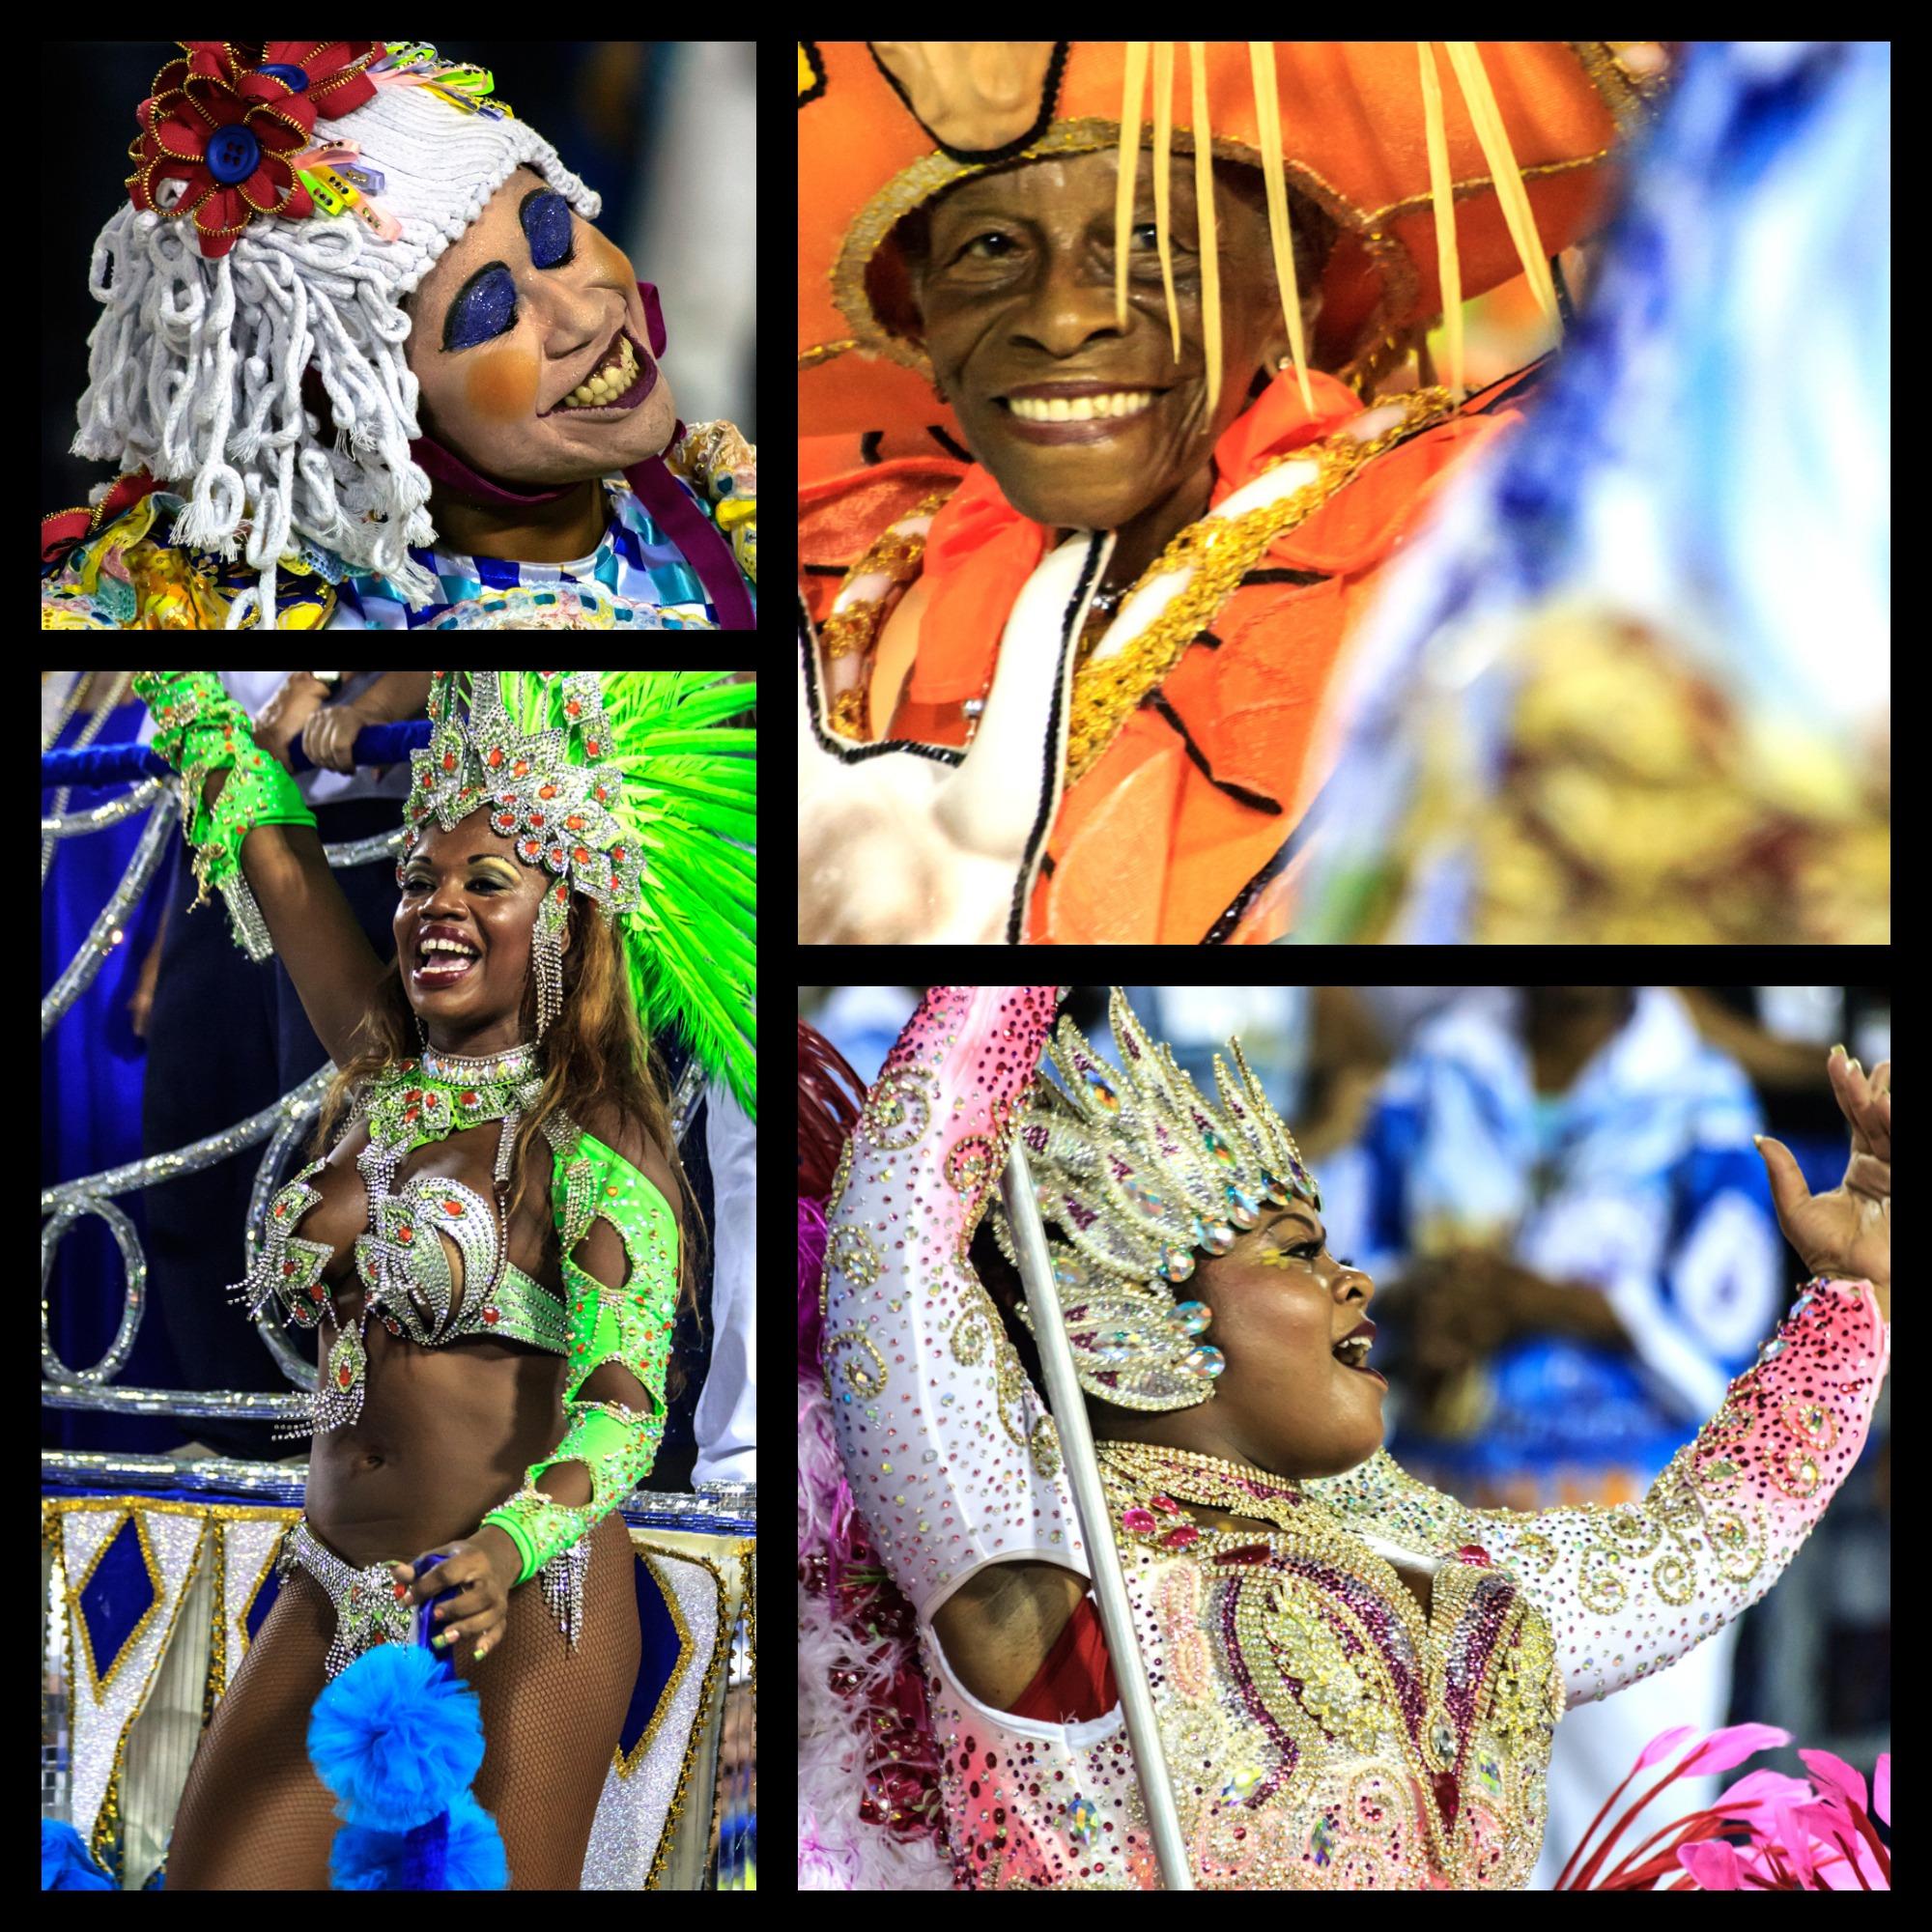 carnaval_001_inma_serrano_esparza